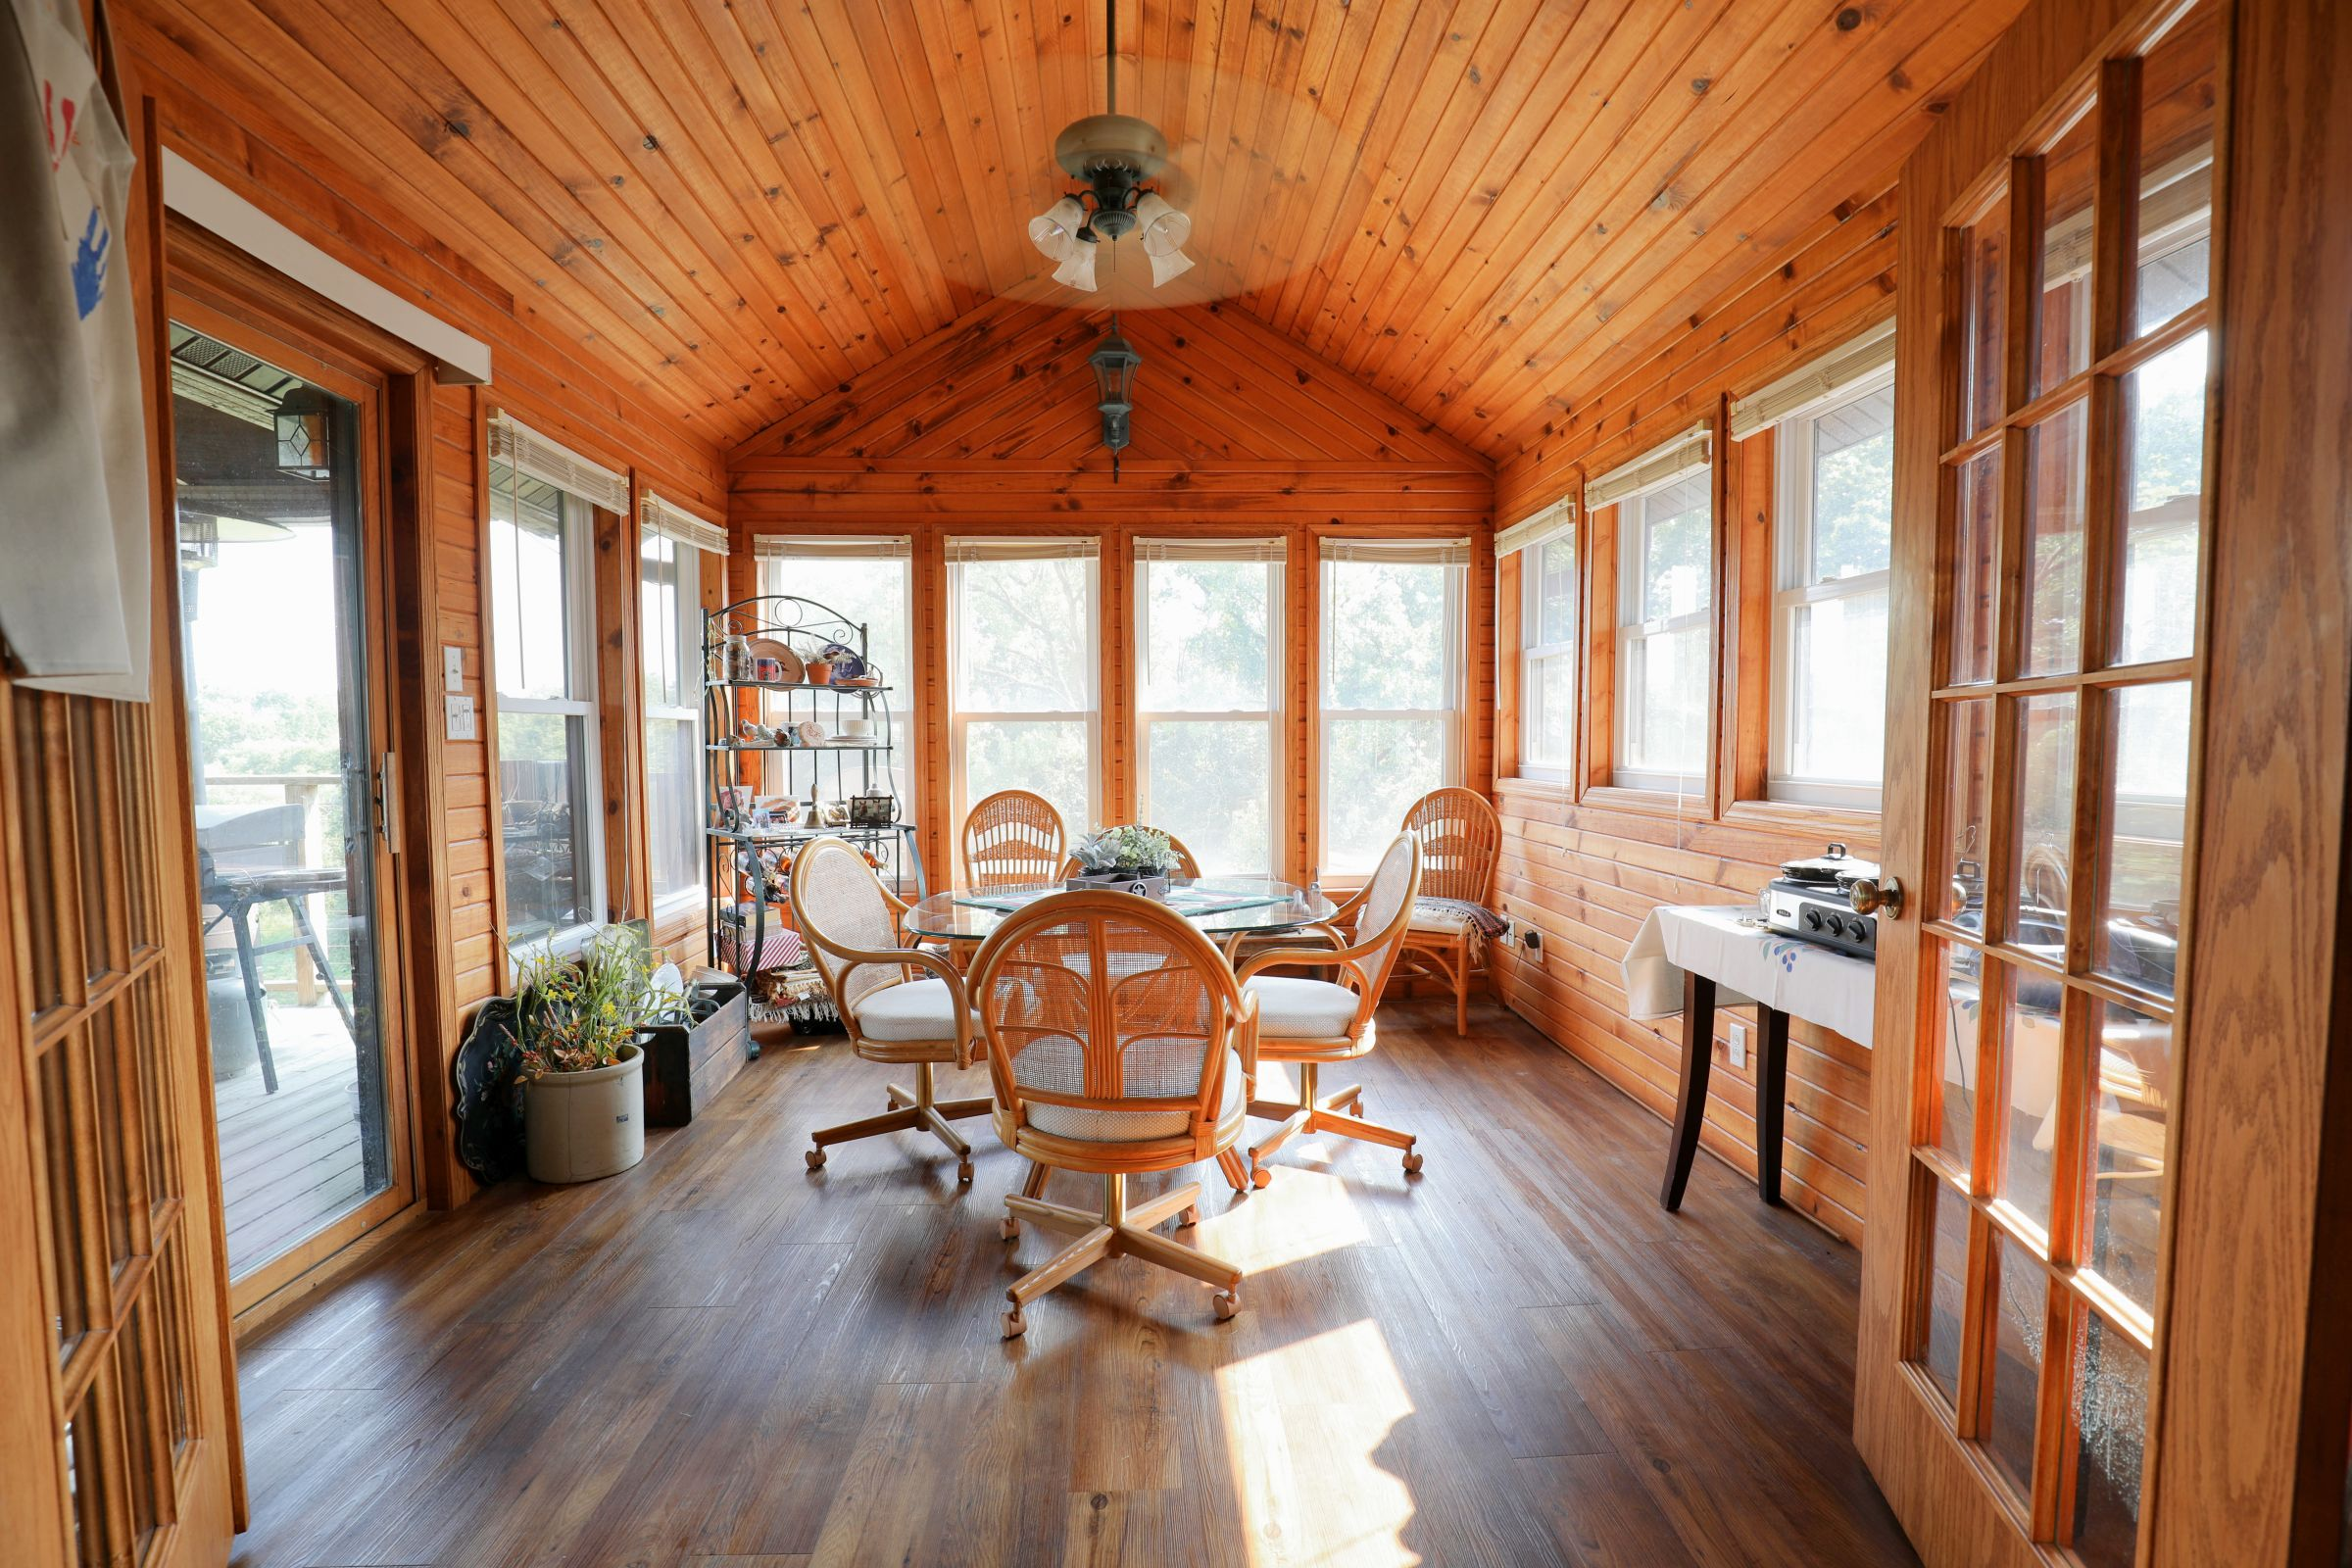 land-lee-county-iowa-328-acres-listing-number-15137-3-2020-08-27-174406.jpg